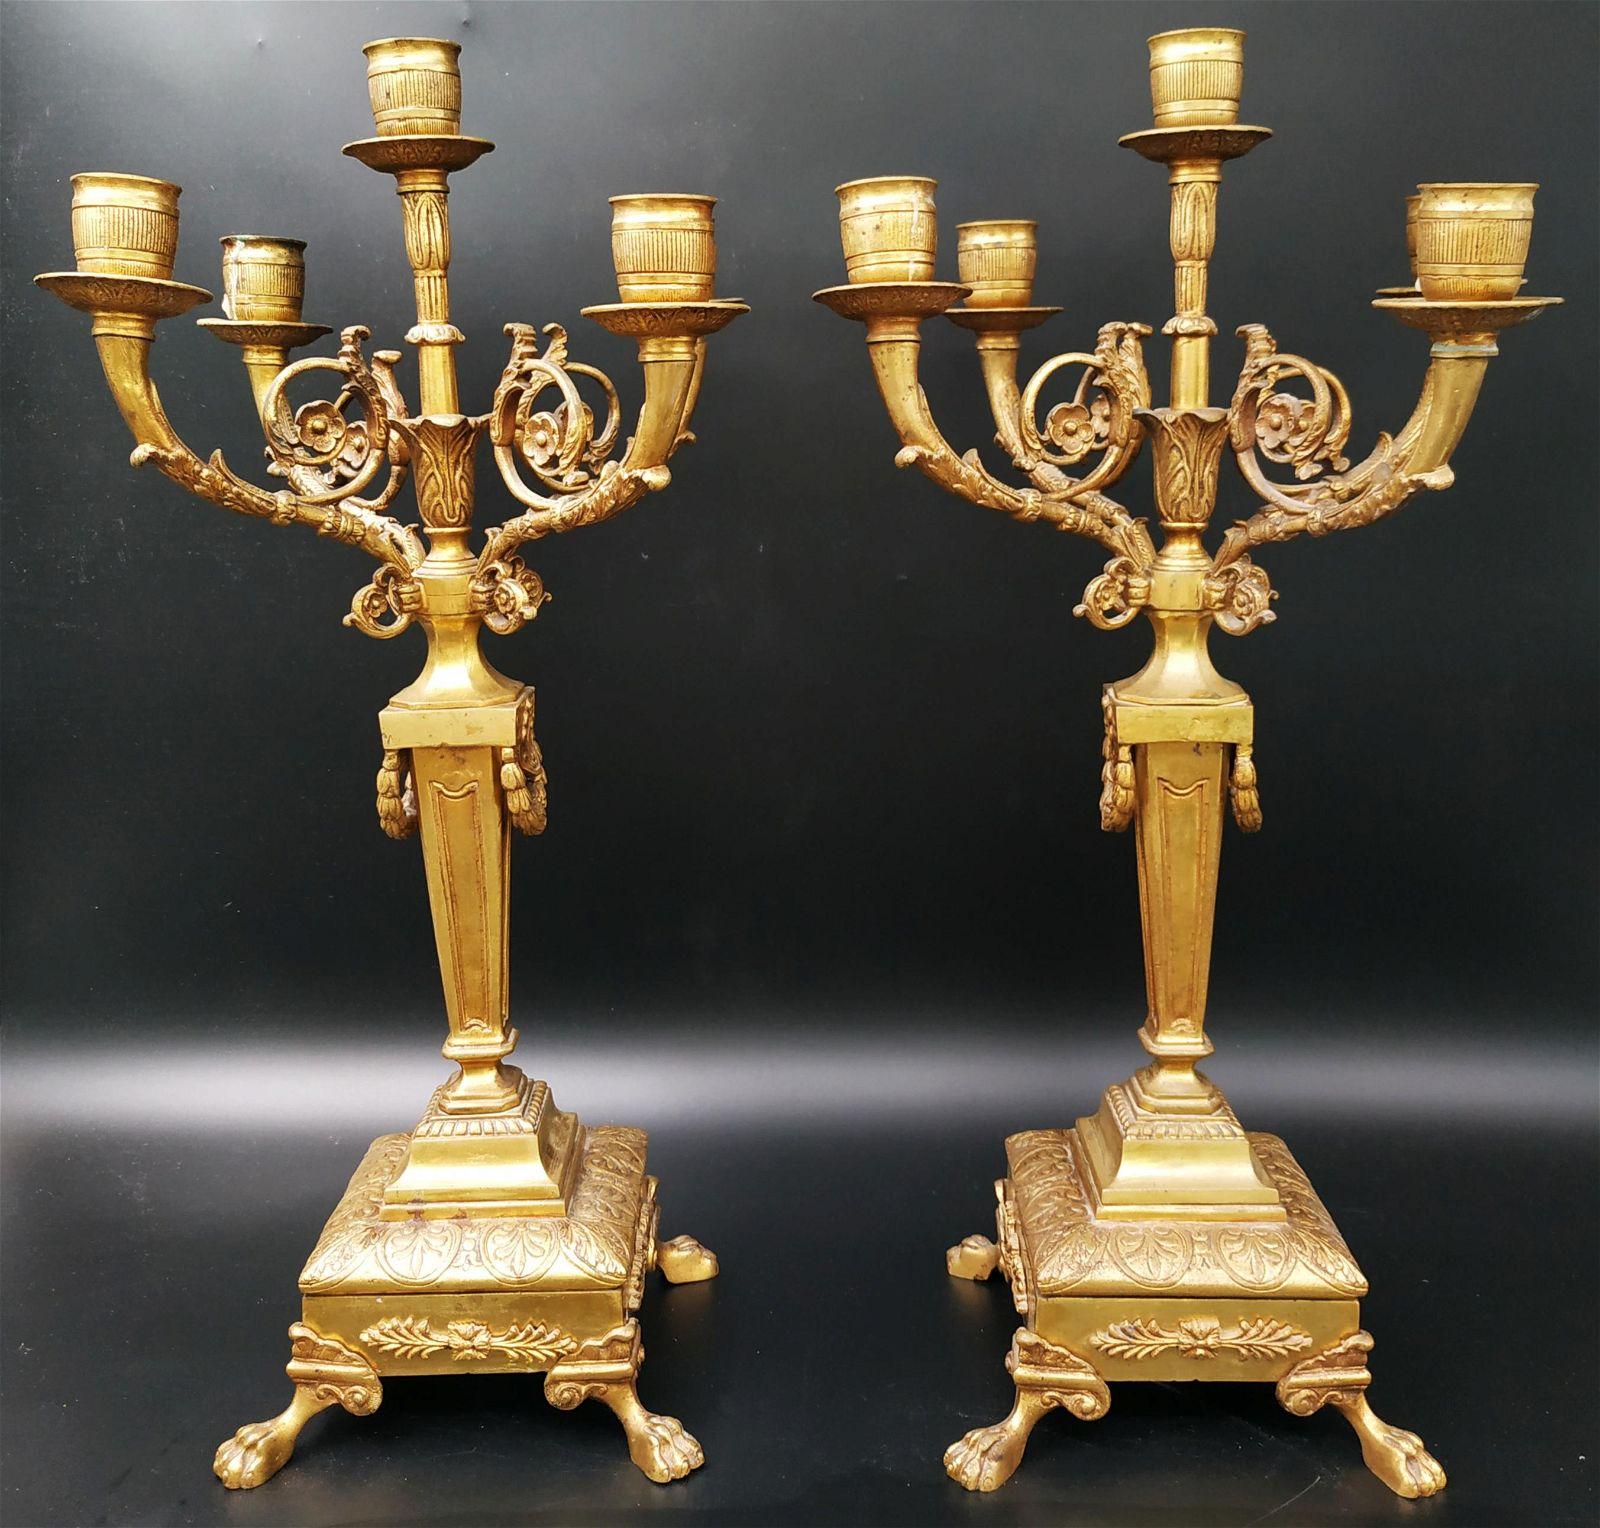 Pair of French bronze candelabra